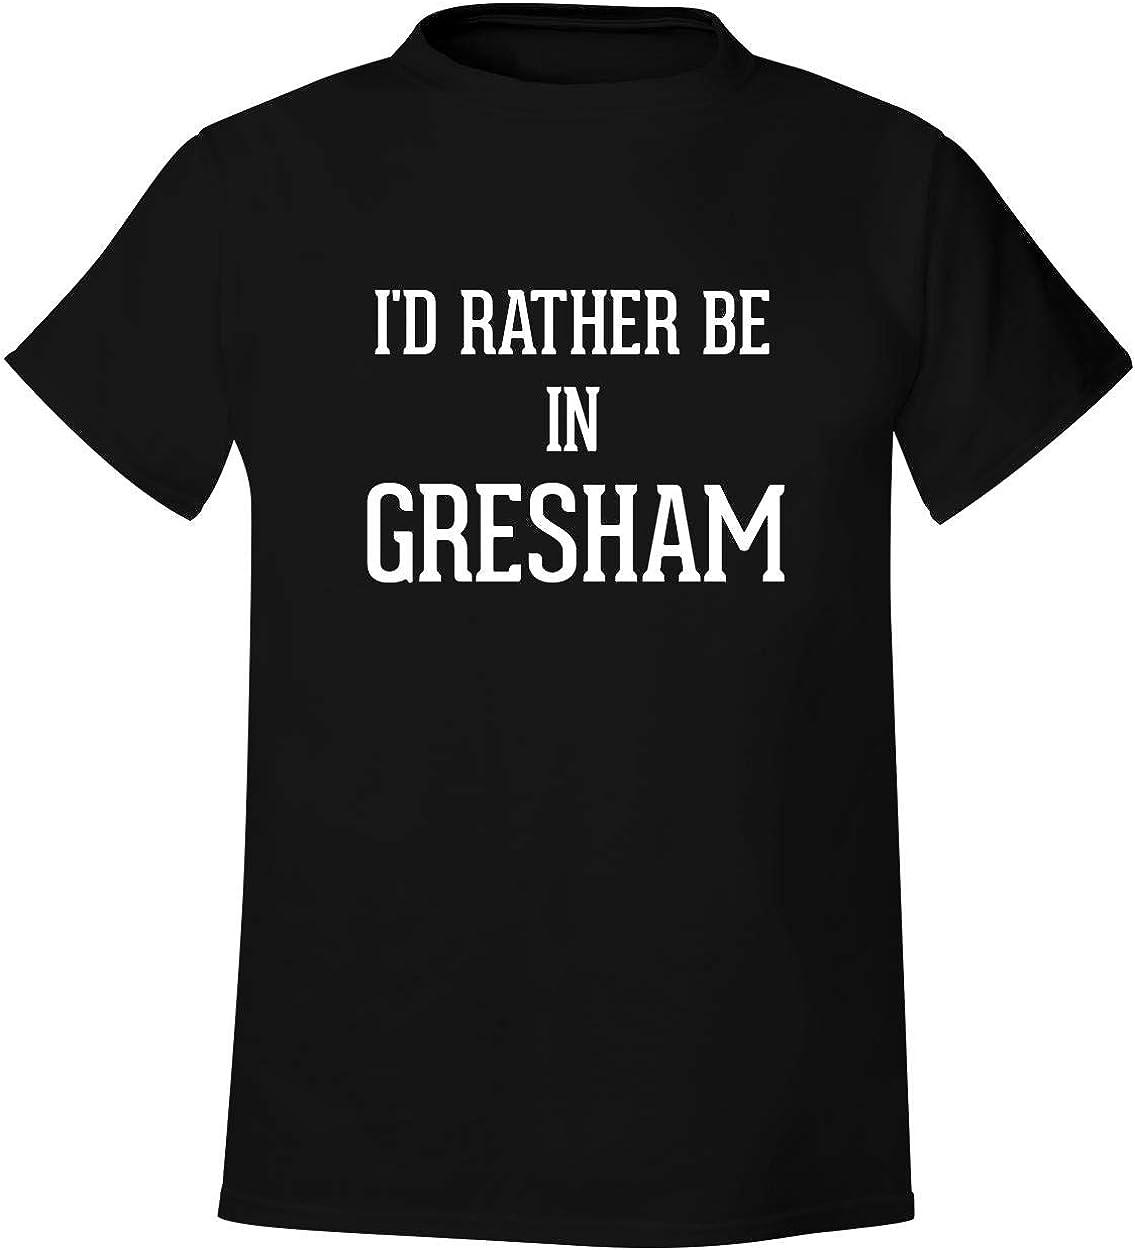 I'd Rather Be In GRESHAM - Men's Soft & Comfortable T-Shirt